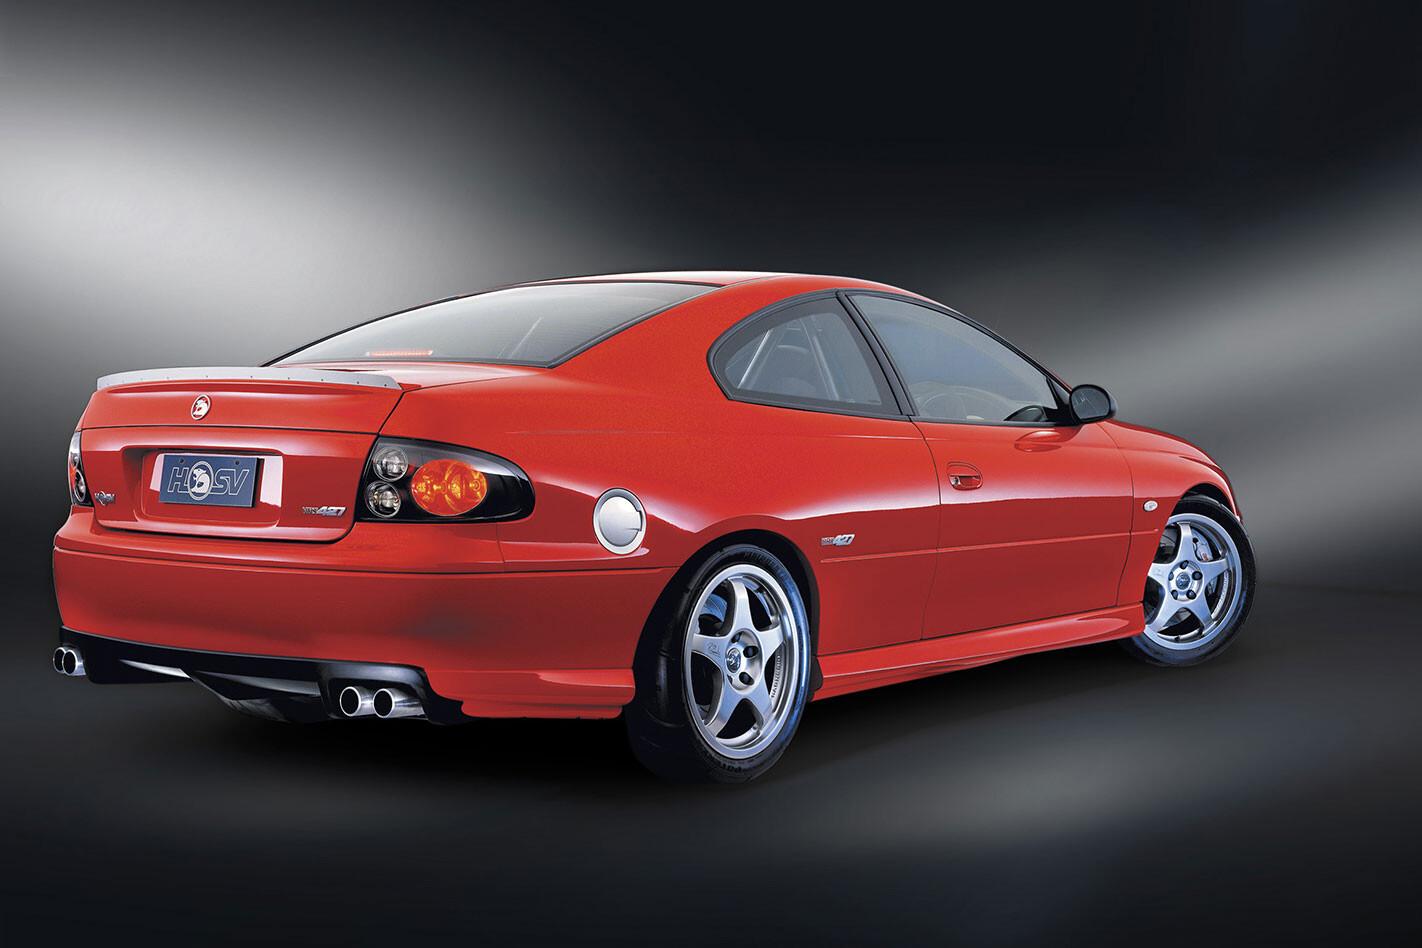 2002 Hsv Hrt 427 Concept Jpg